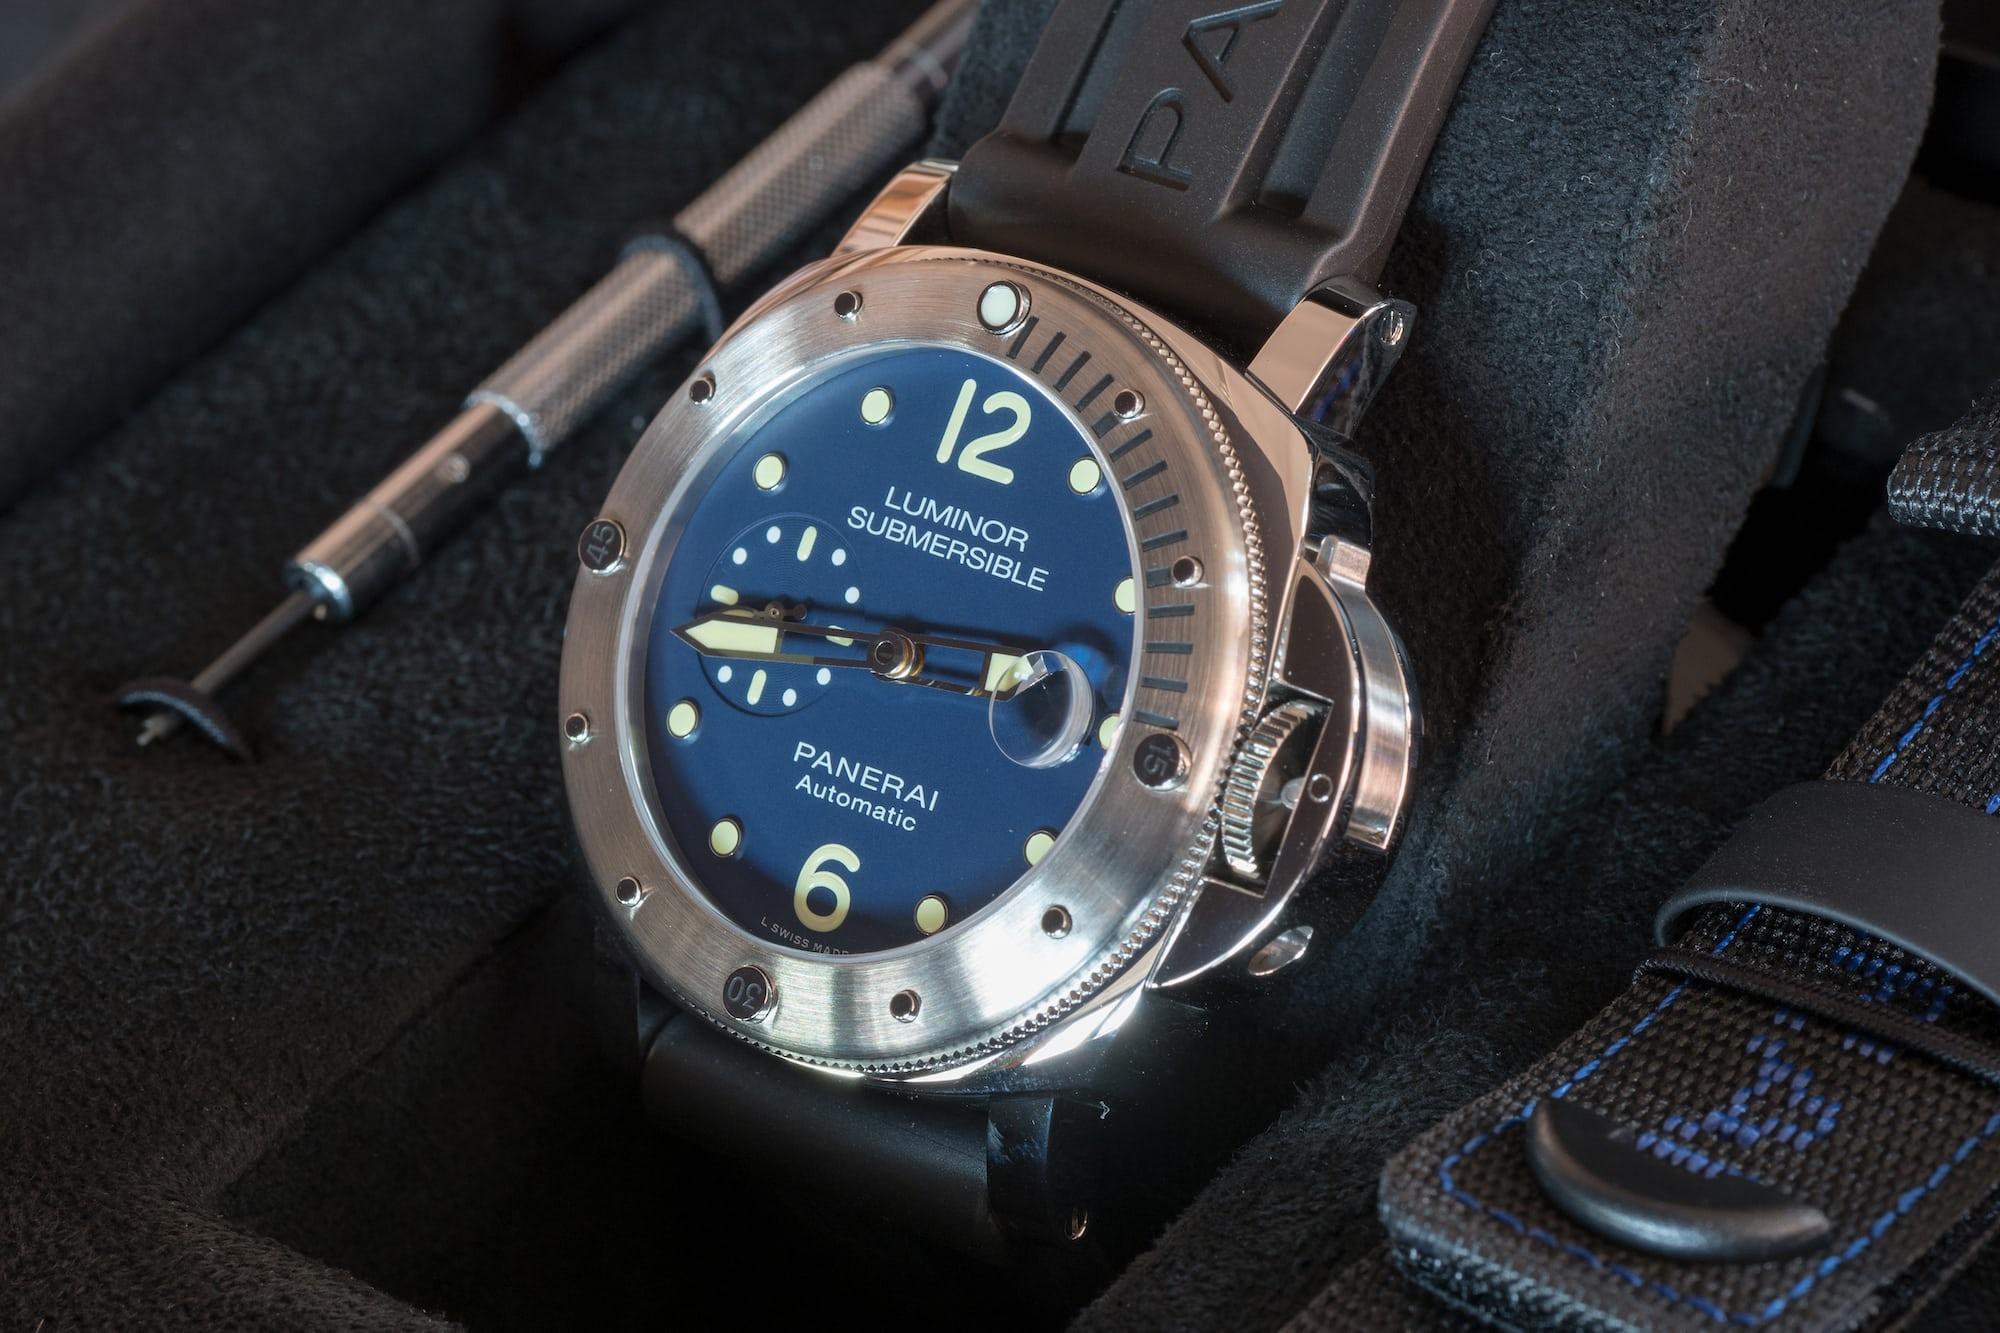 Panerai Luminor Submersible Acciaio PAM00731 dial